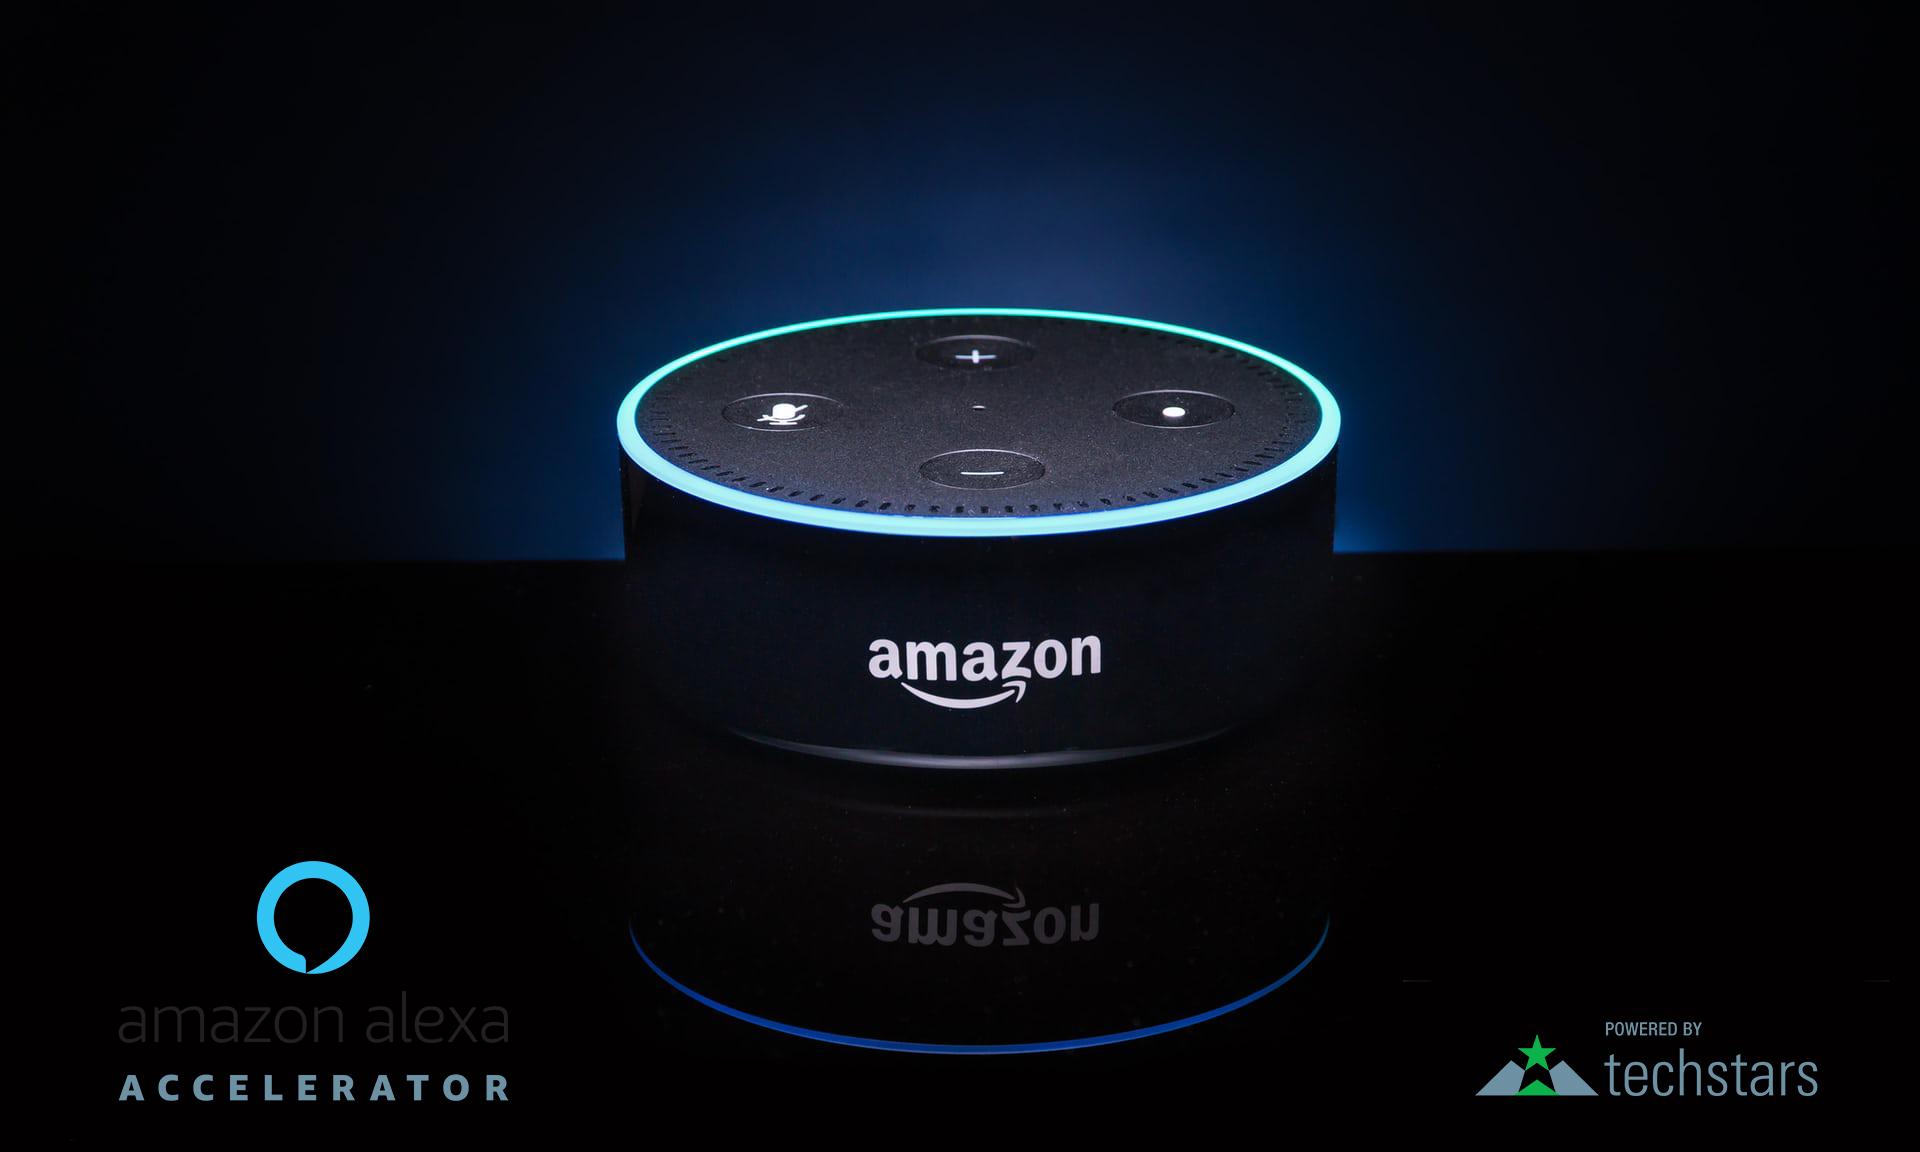 Amazon Alexa Accelerator propulse 9 startups